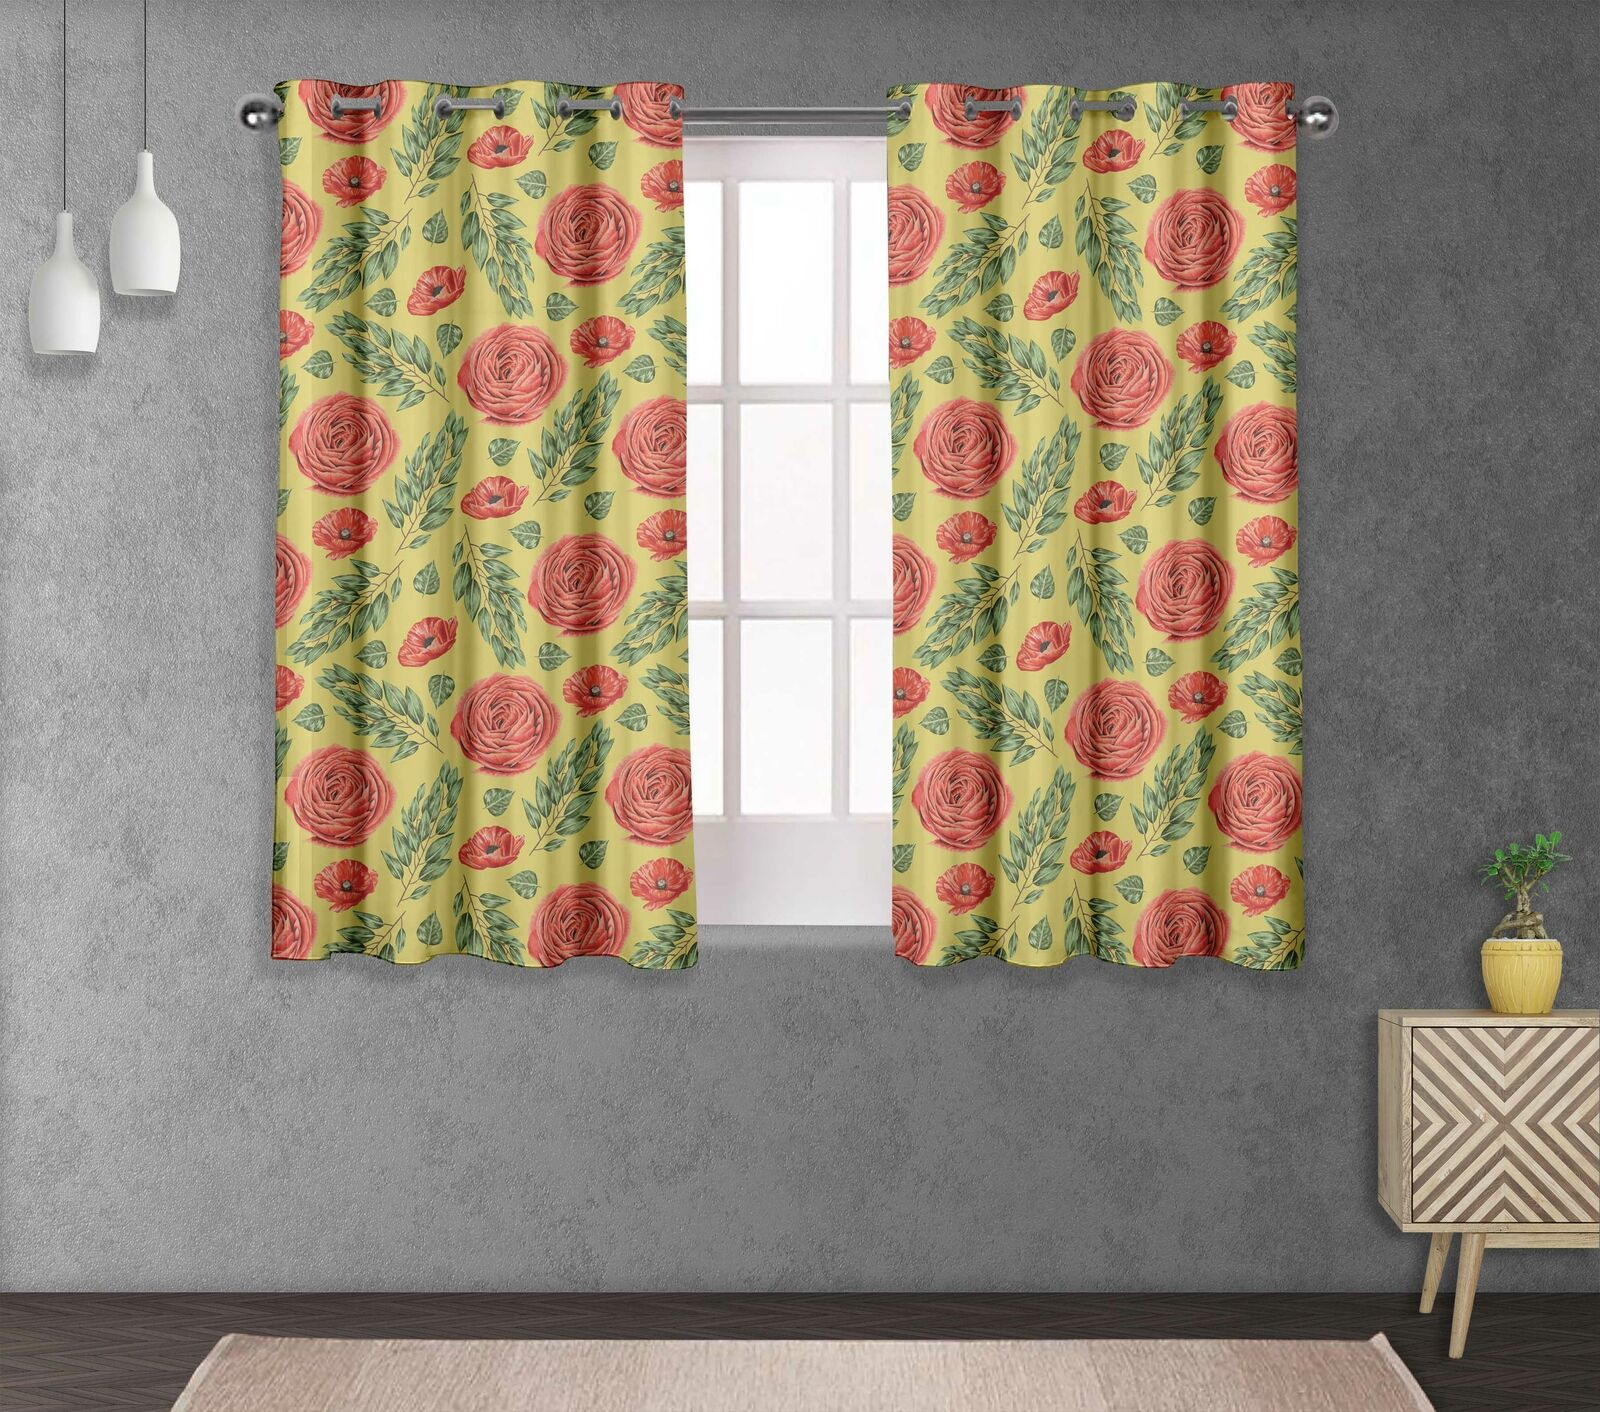 S4sassy Laurel Leaves & Camellias Home Decor short & long Curtain Panel-FL-863G